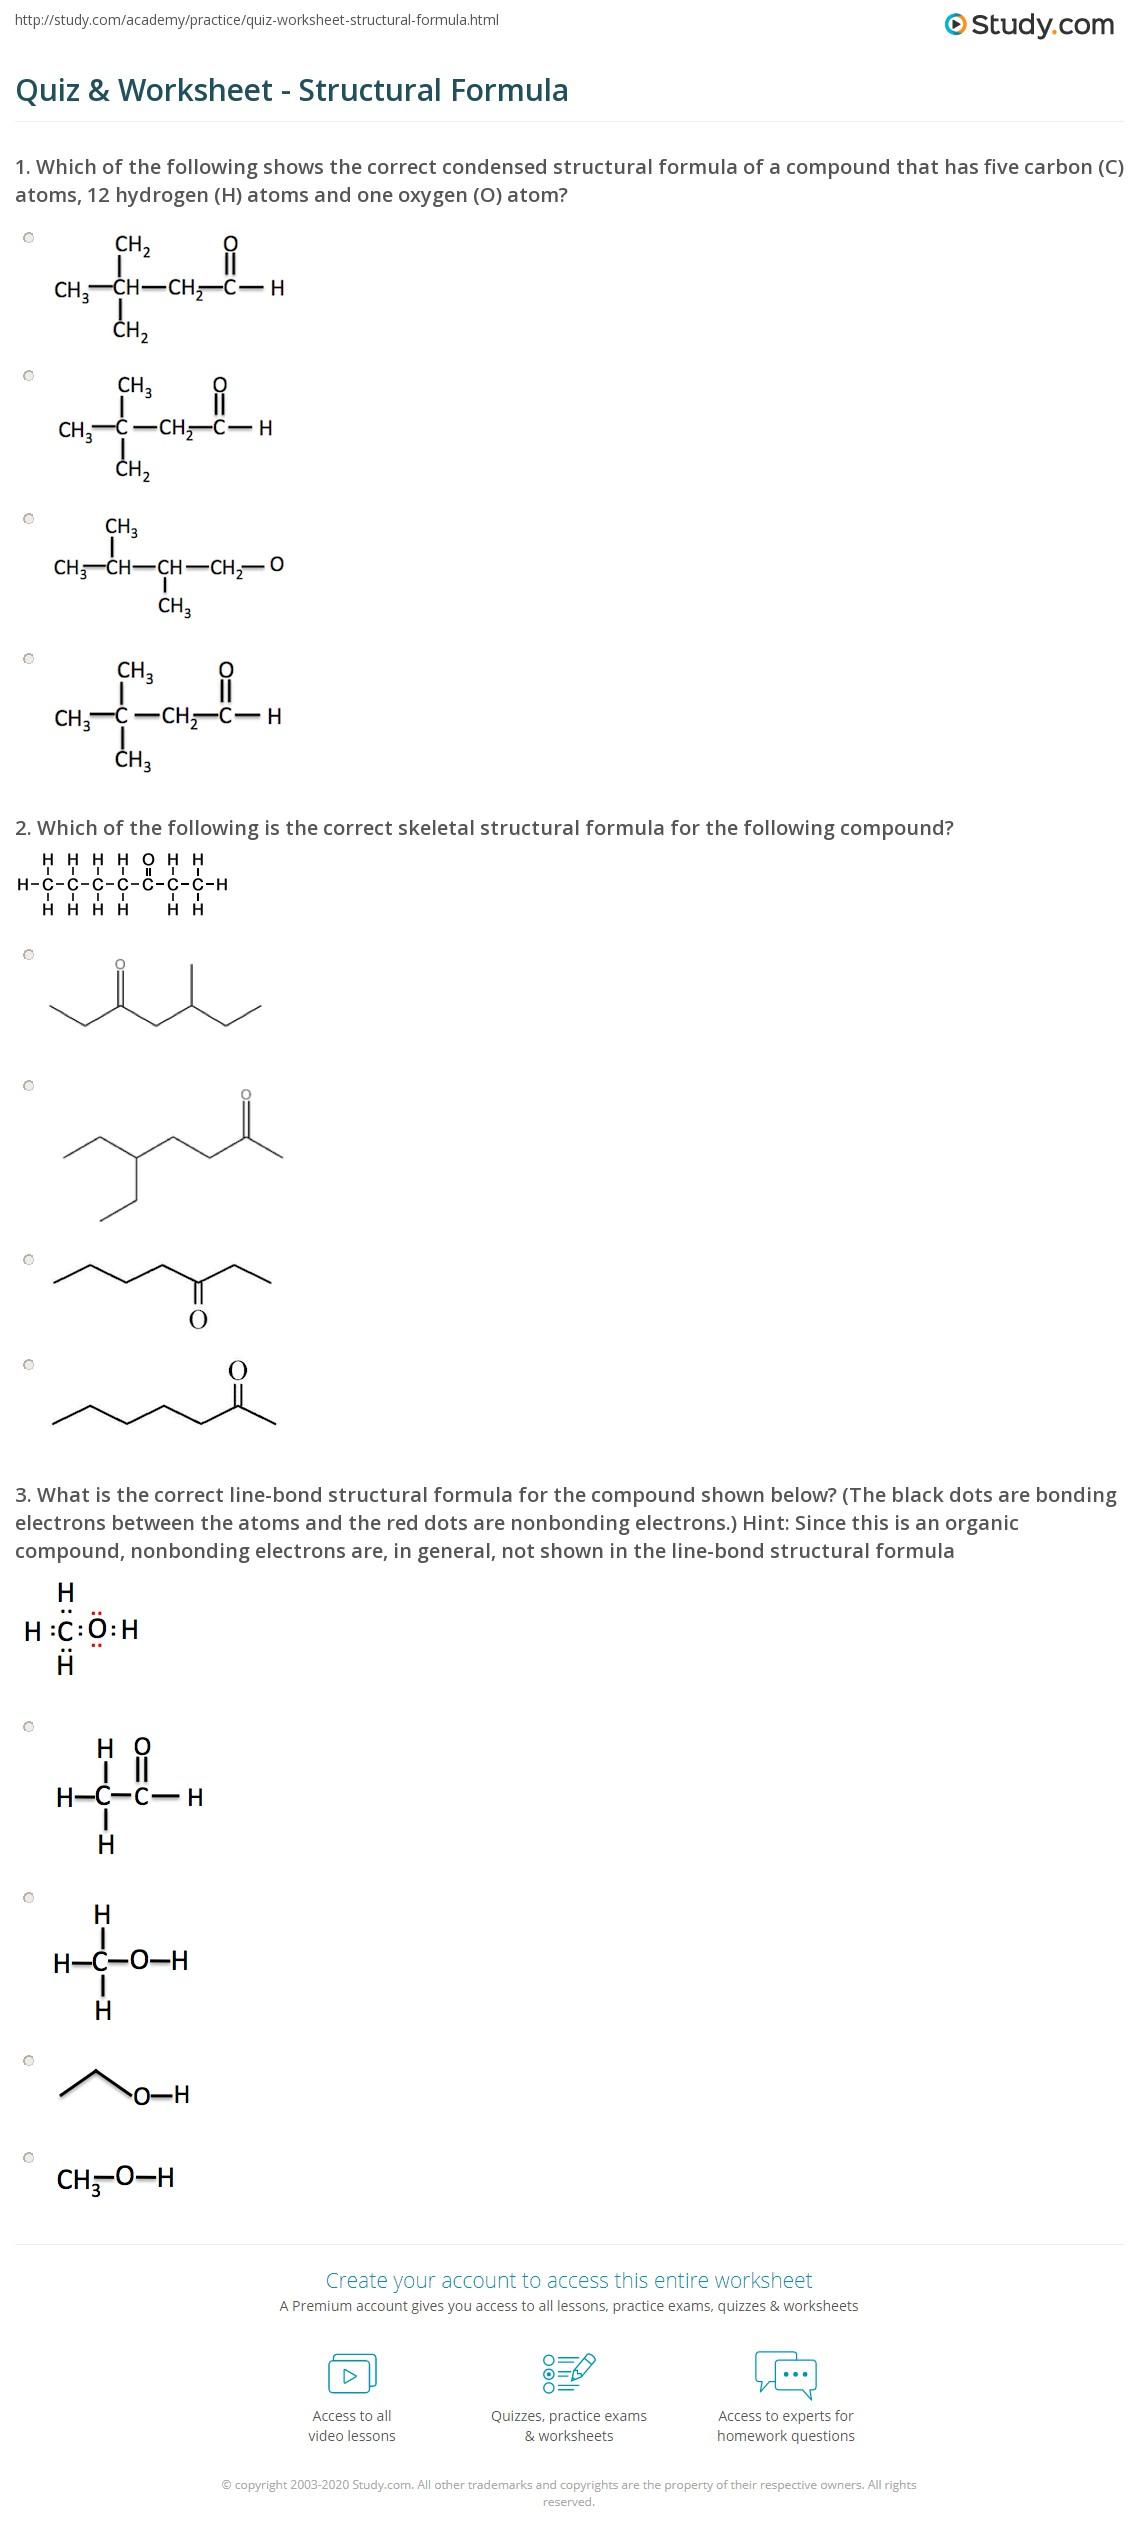 hight resolution of Quiz \u0026 Worksheet - Structural Formula   Study.com